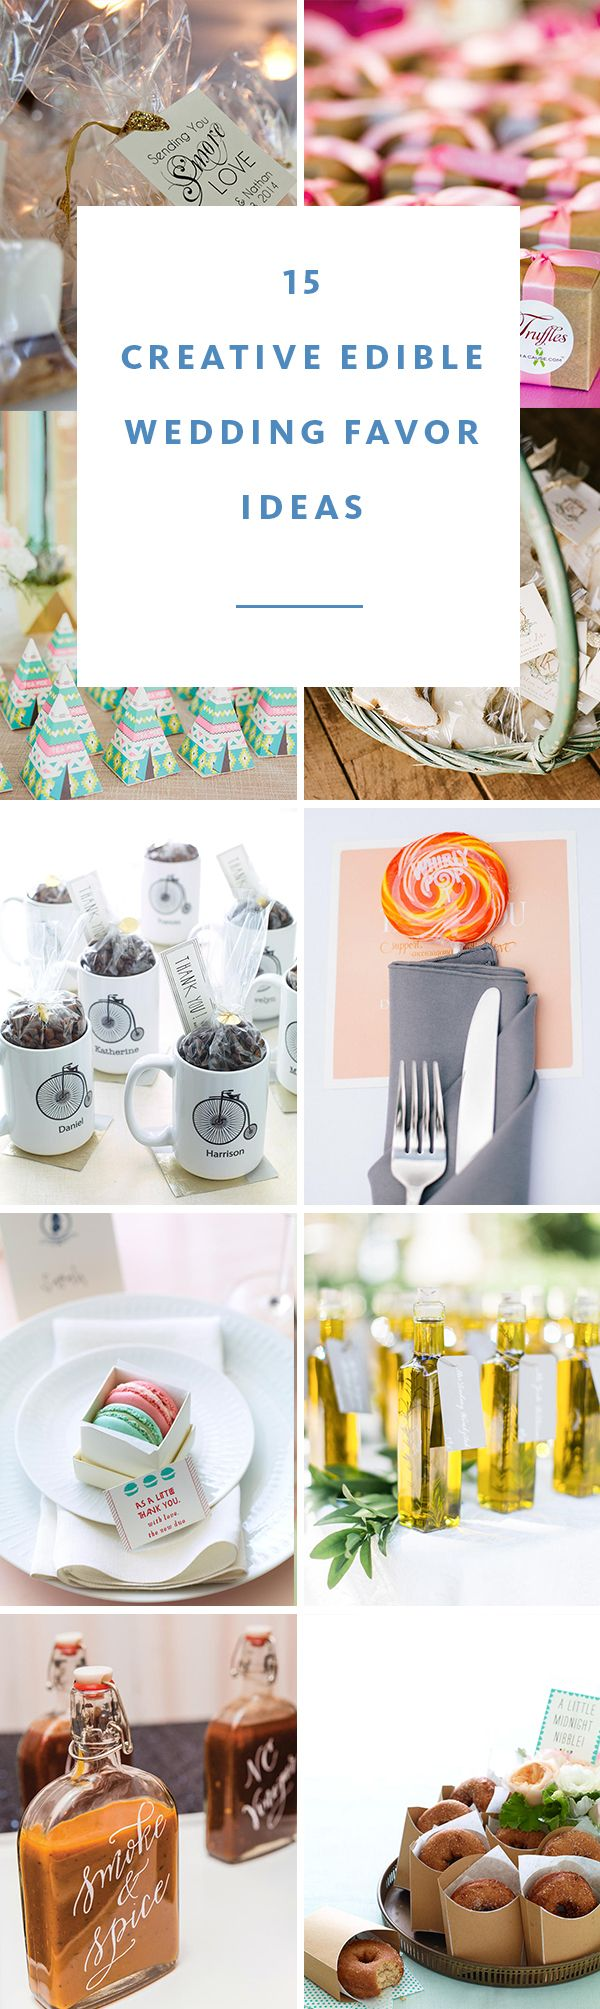 706 best Wedding Favors images on Pinterest | Wedding keepsakes ...